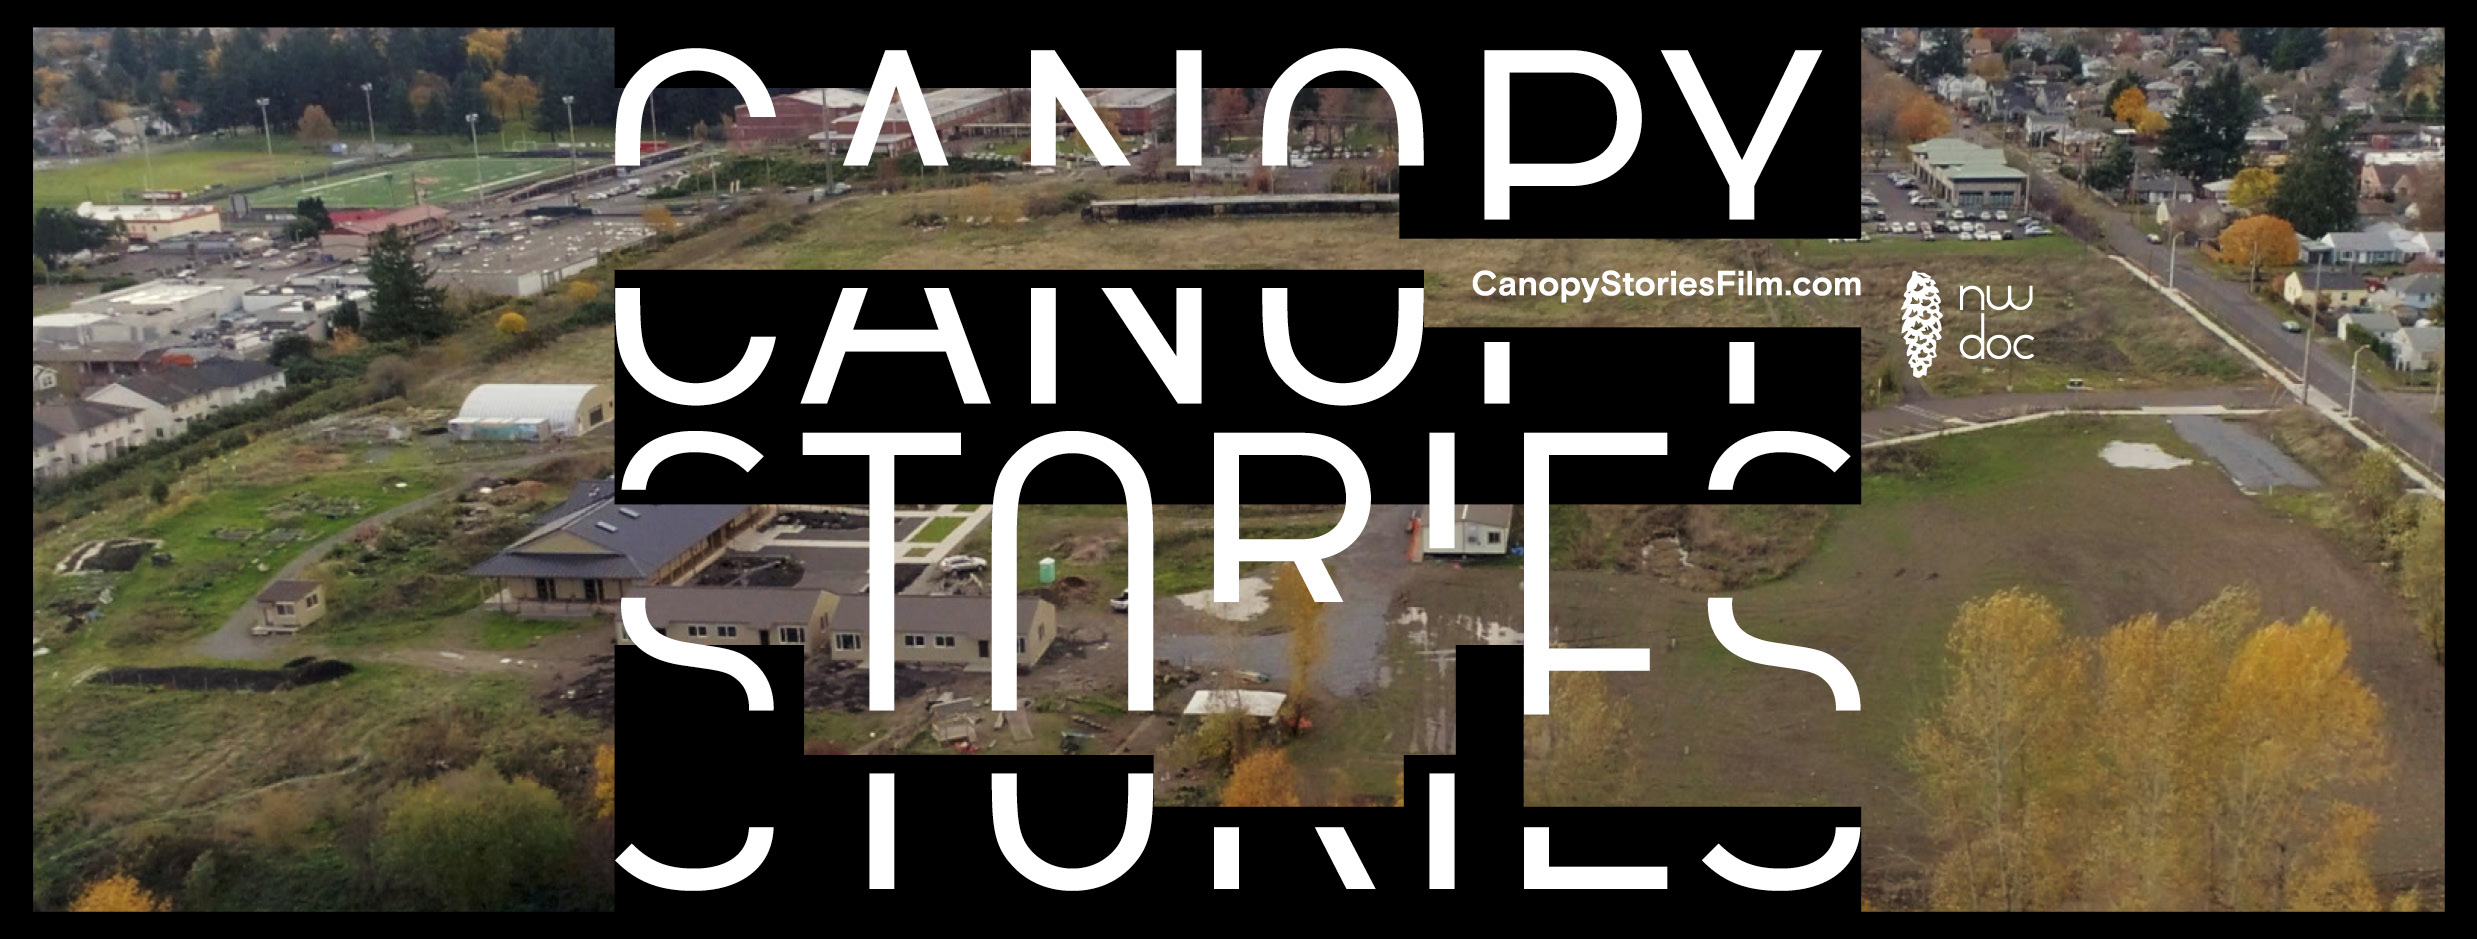 CanopyStories-FacebookCanvas7.jpg